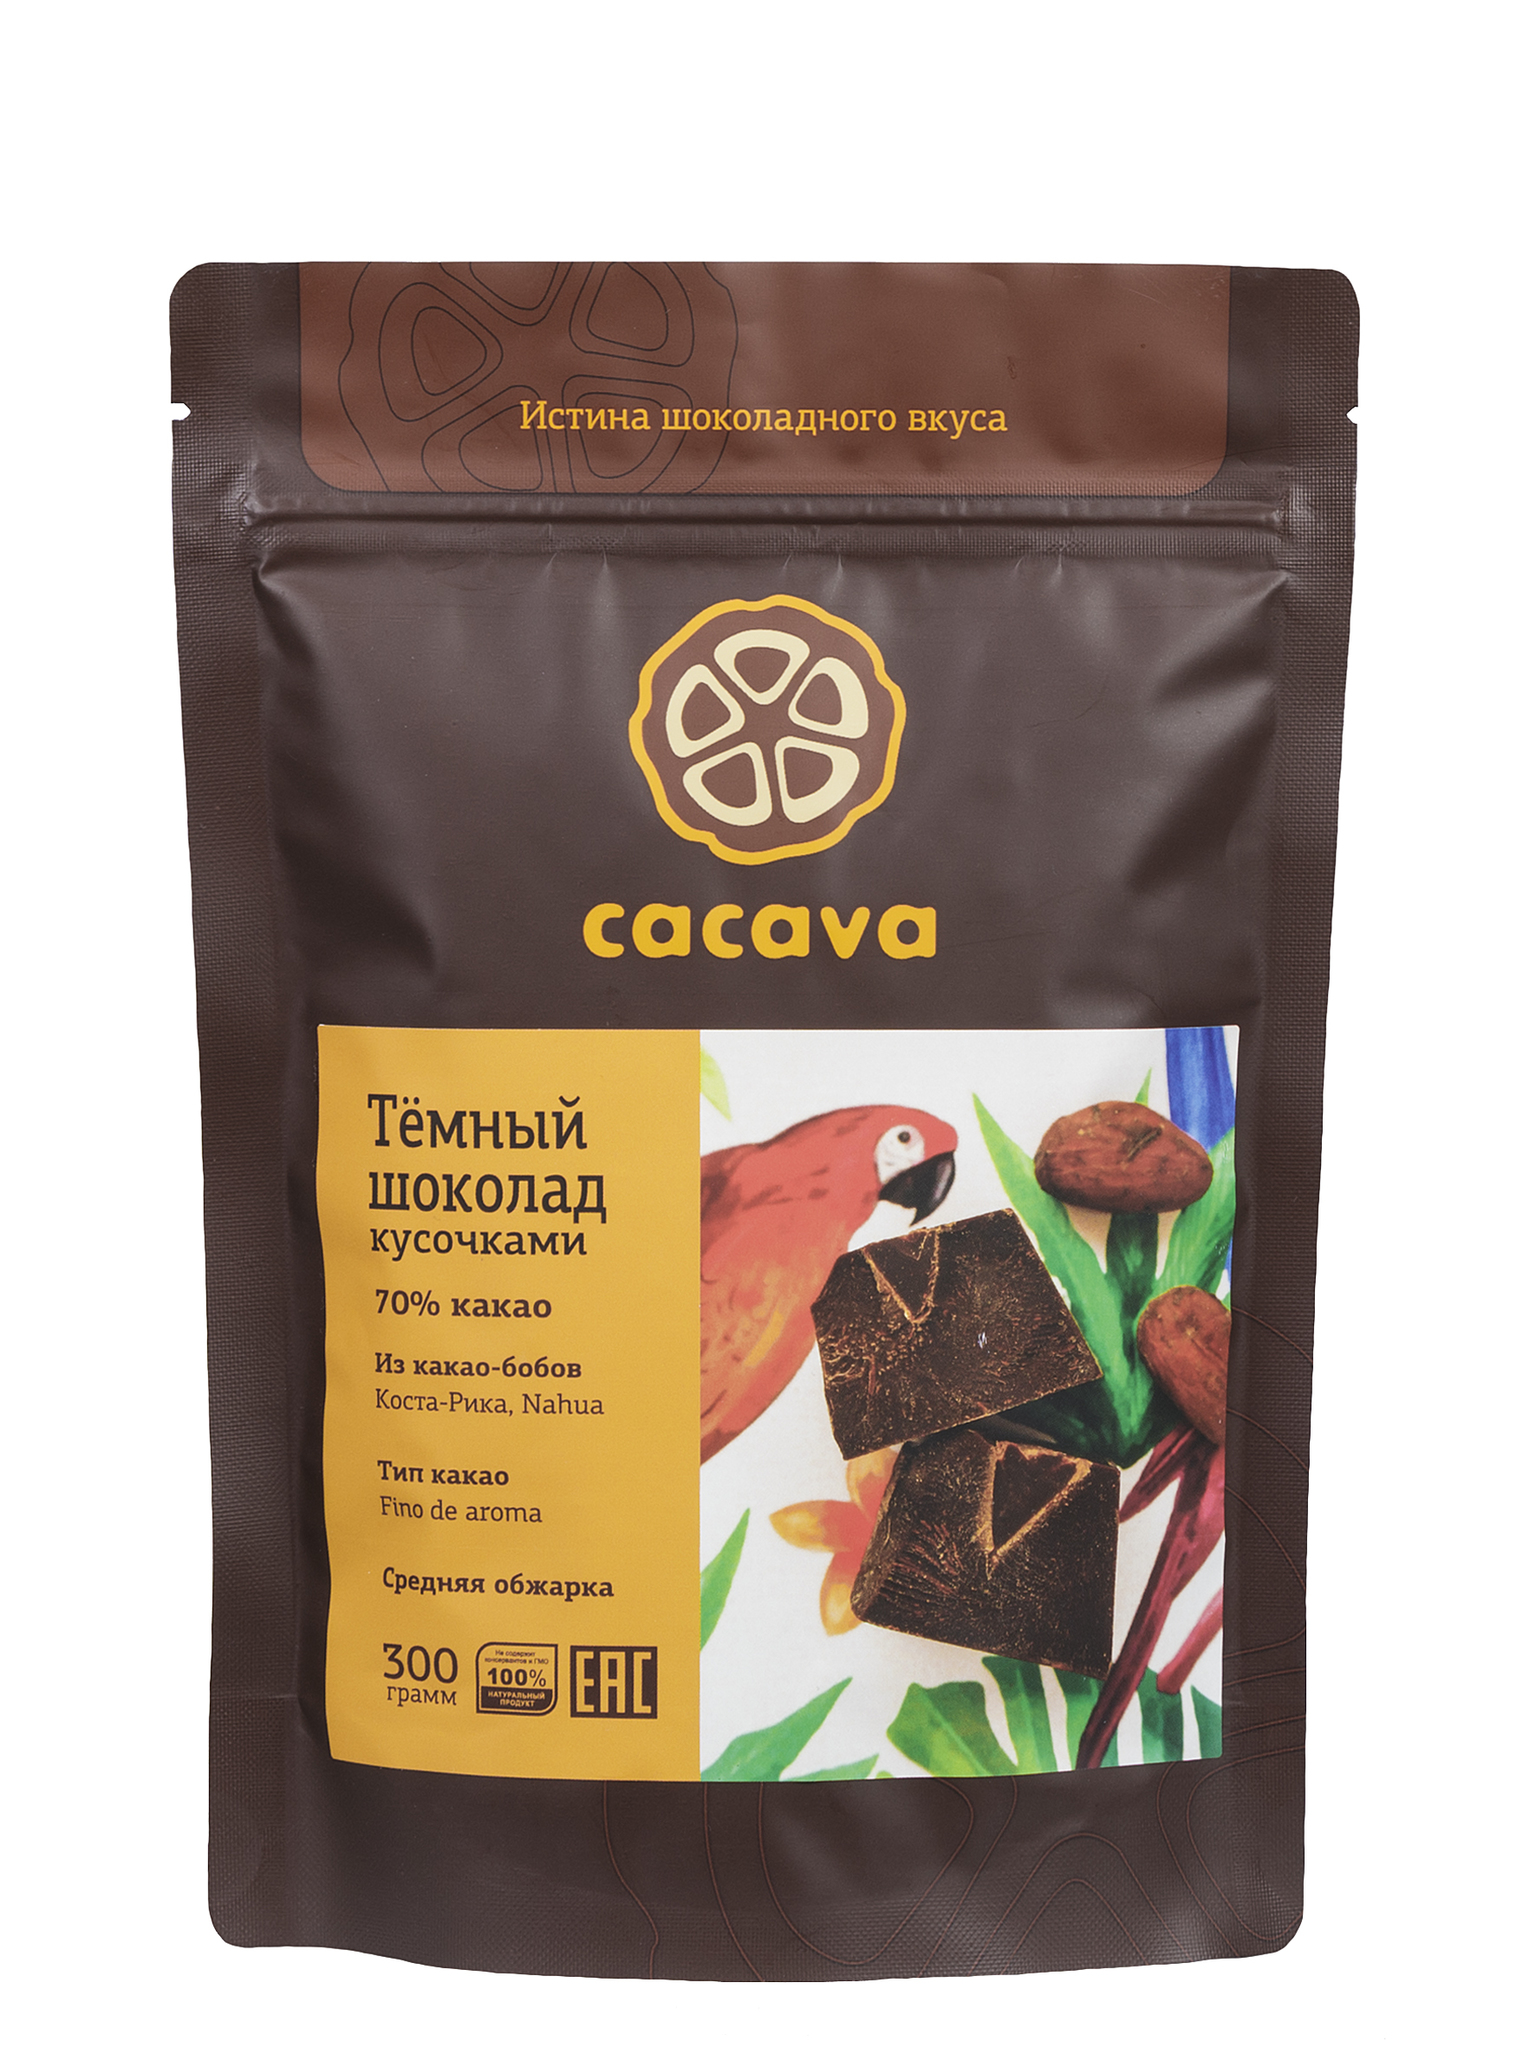 Тёмный шоколад 70 % какао (Коста-Рика), упаковка 300 грамм